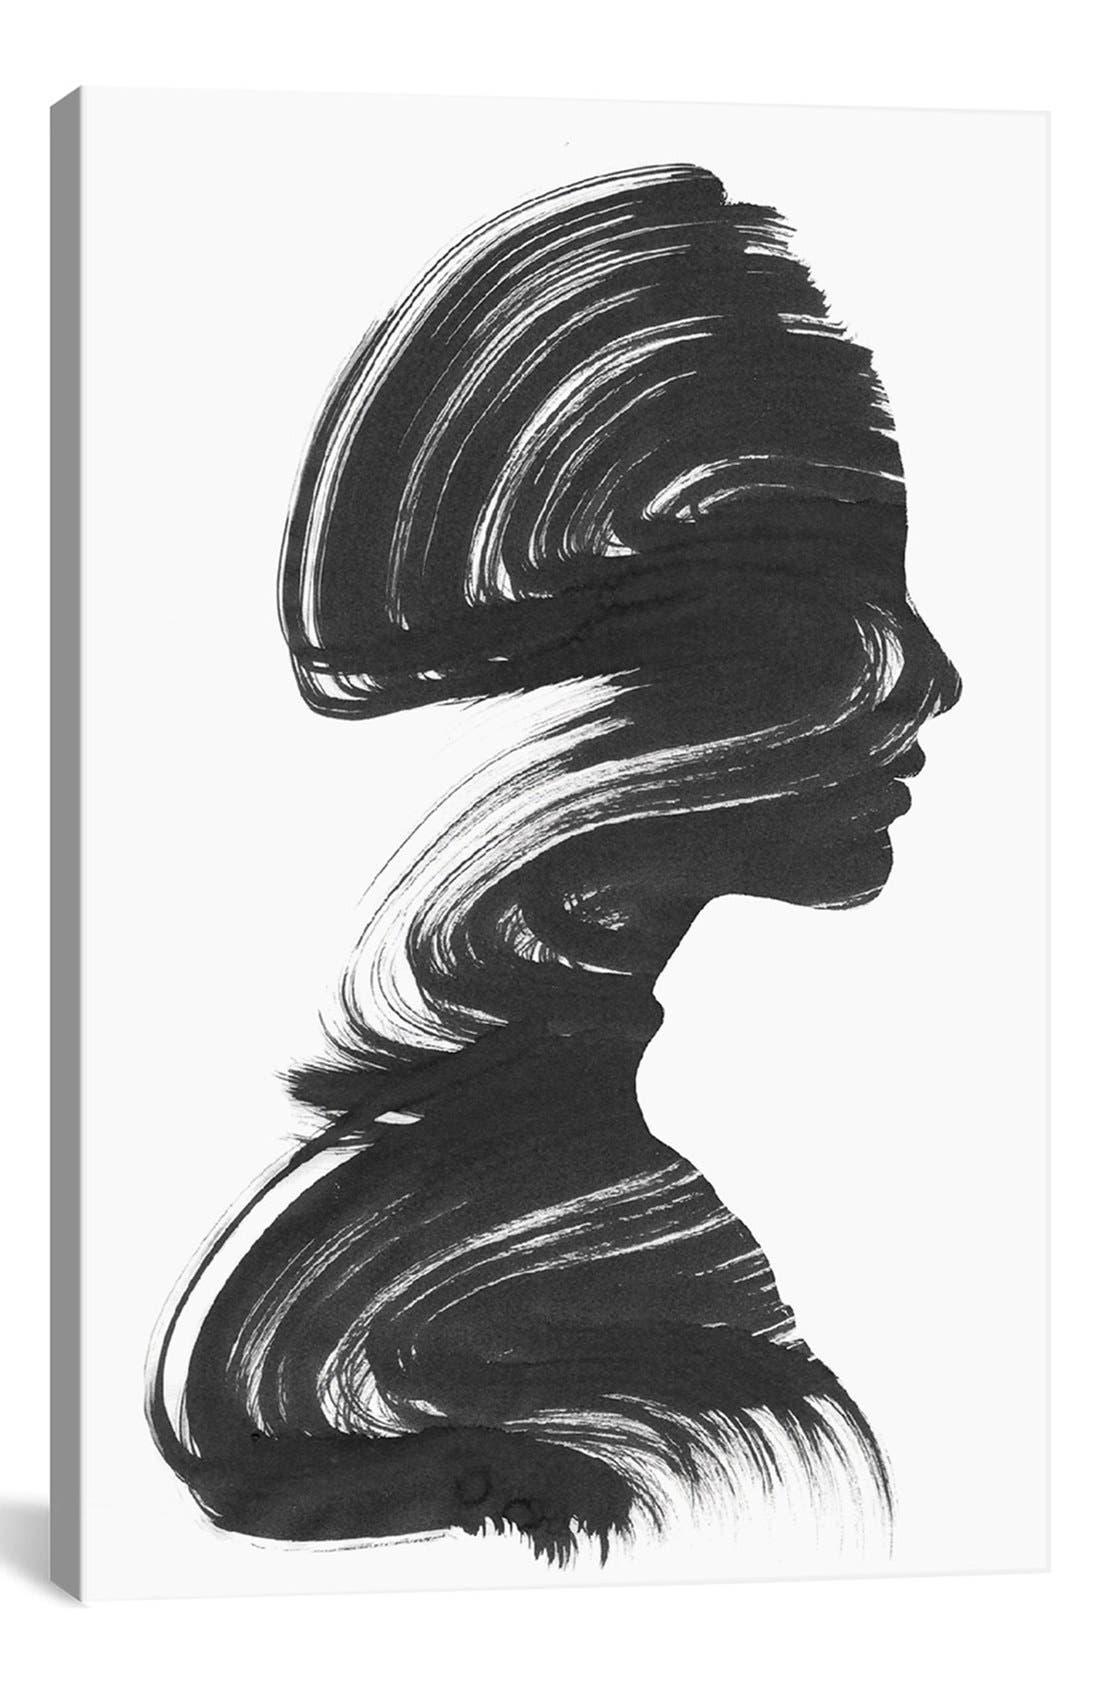 ICANVAS 'See' Giclée Print Canvas Art, Main, color, WHITE